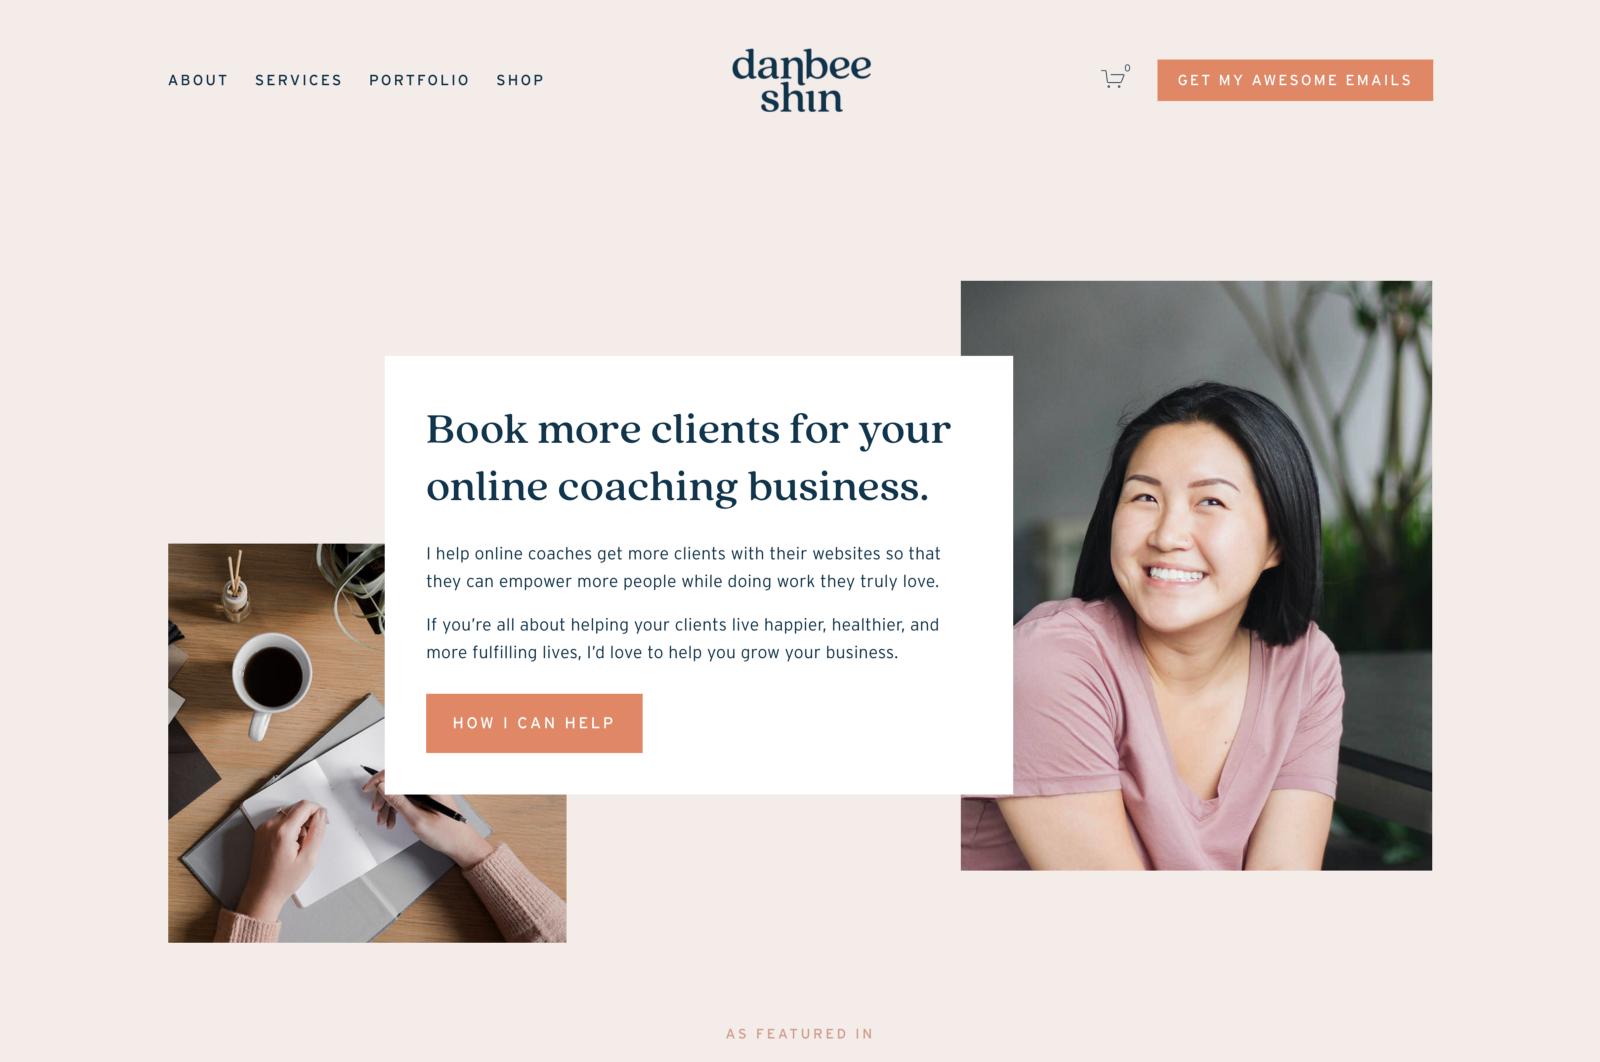 Web design portfolio example (source)